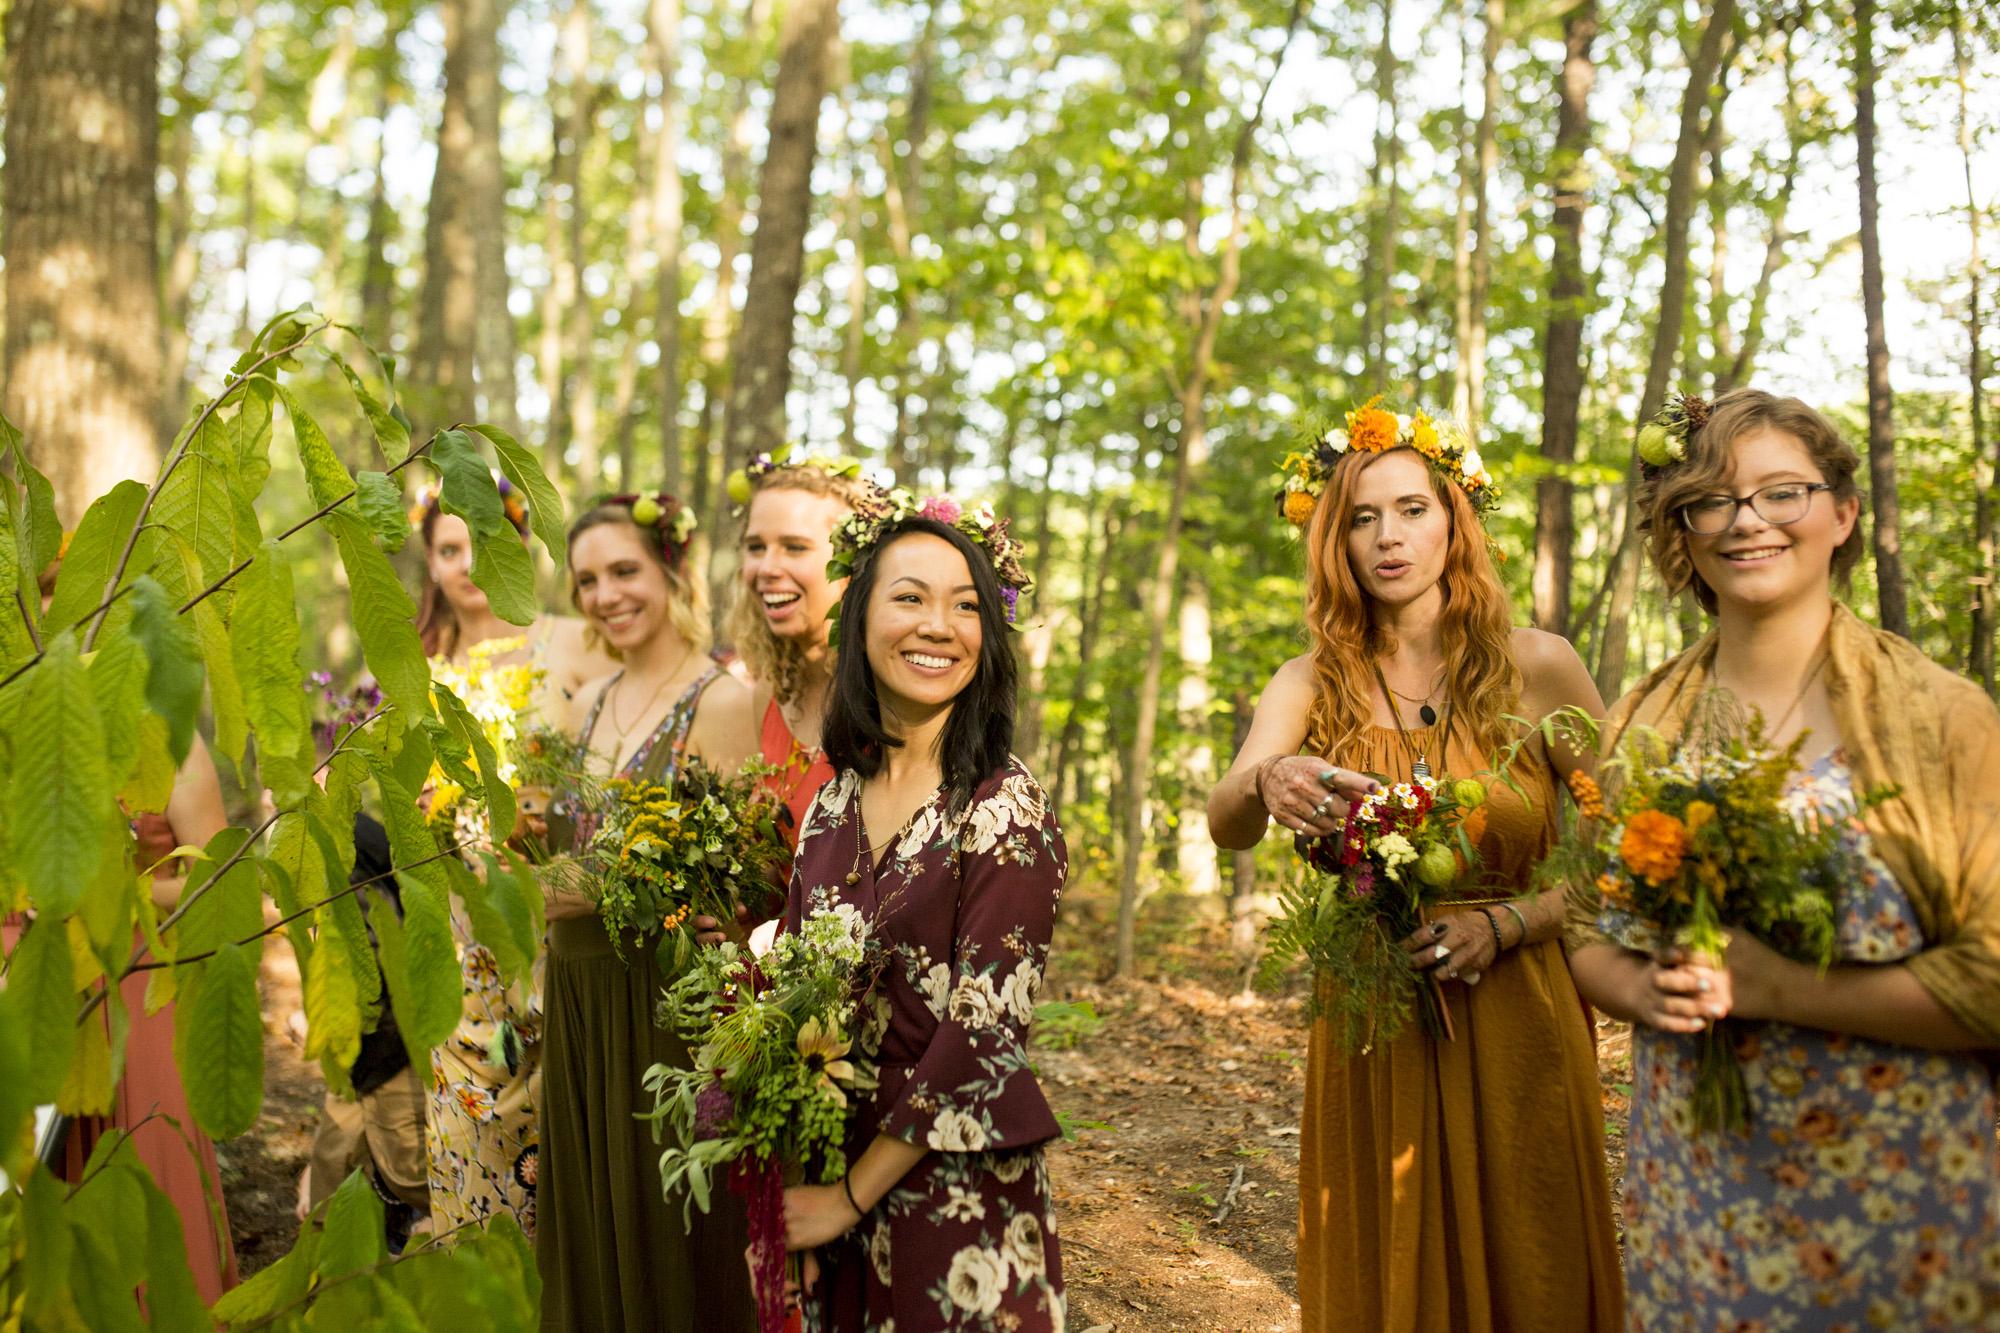 Seriously_Sabrina_Photography_Red_River_Gorge_Kentucky_Wedding_ShawnDana123.jpg